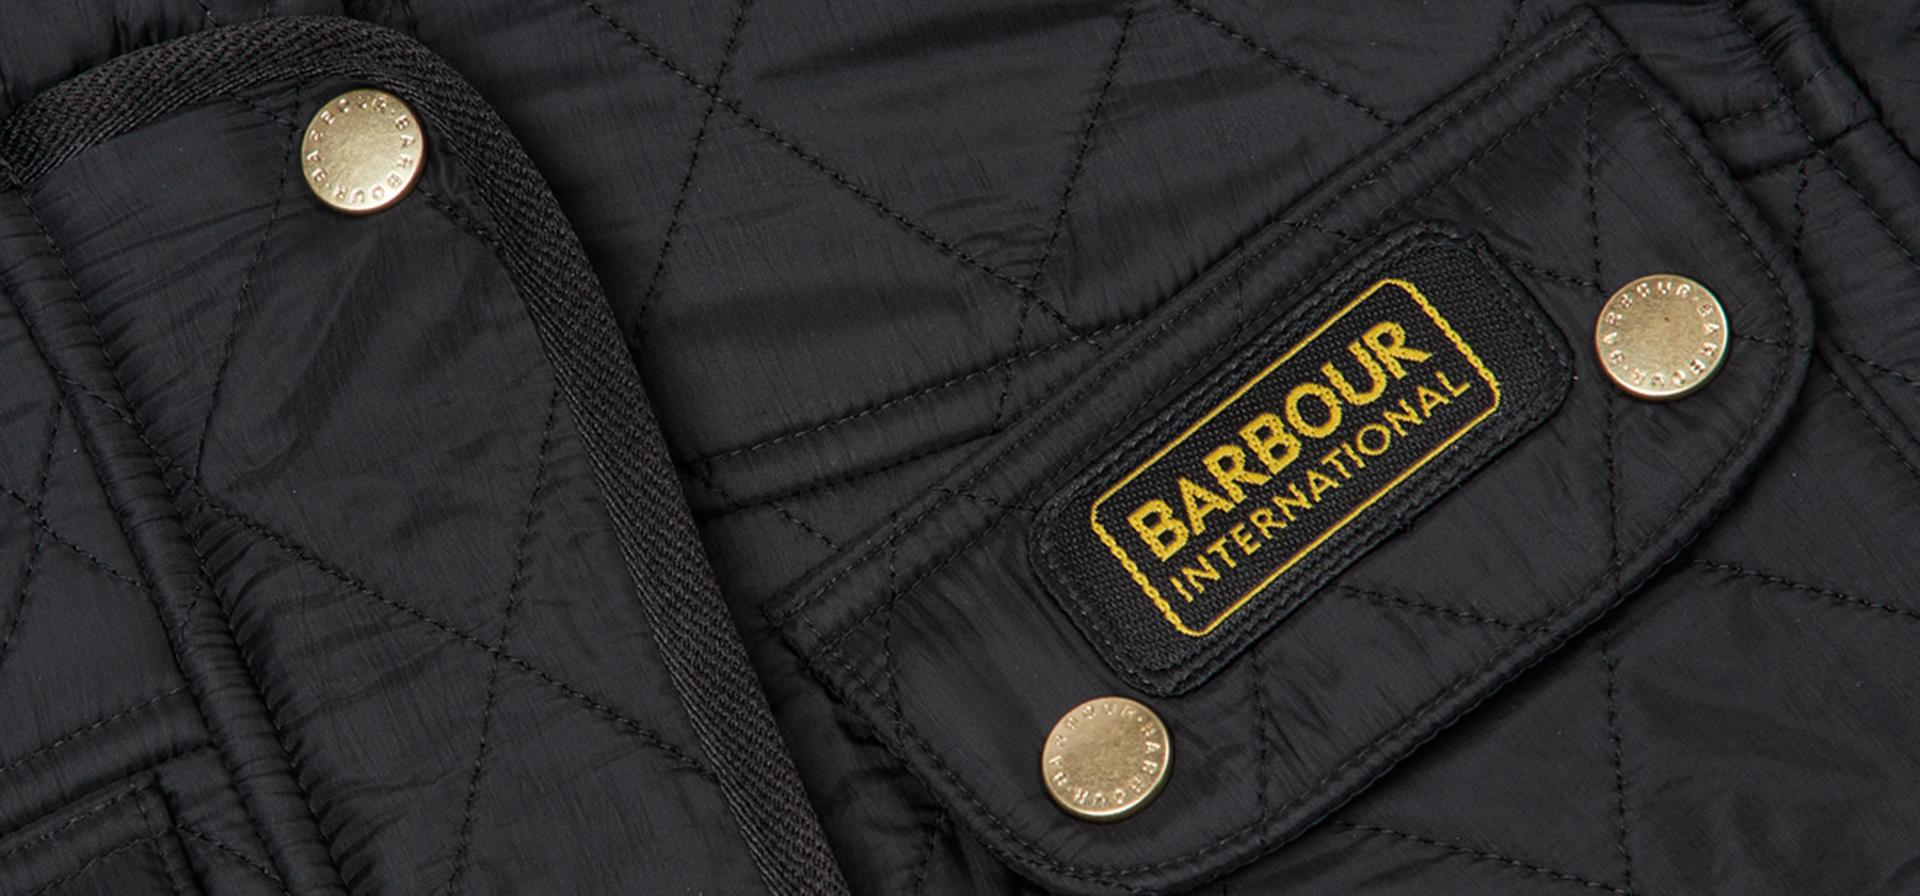 (Barbour) Badge of An Original